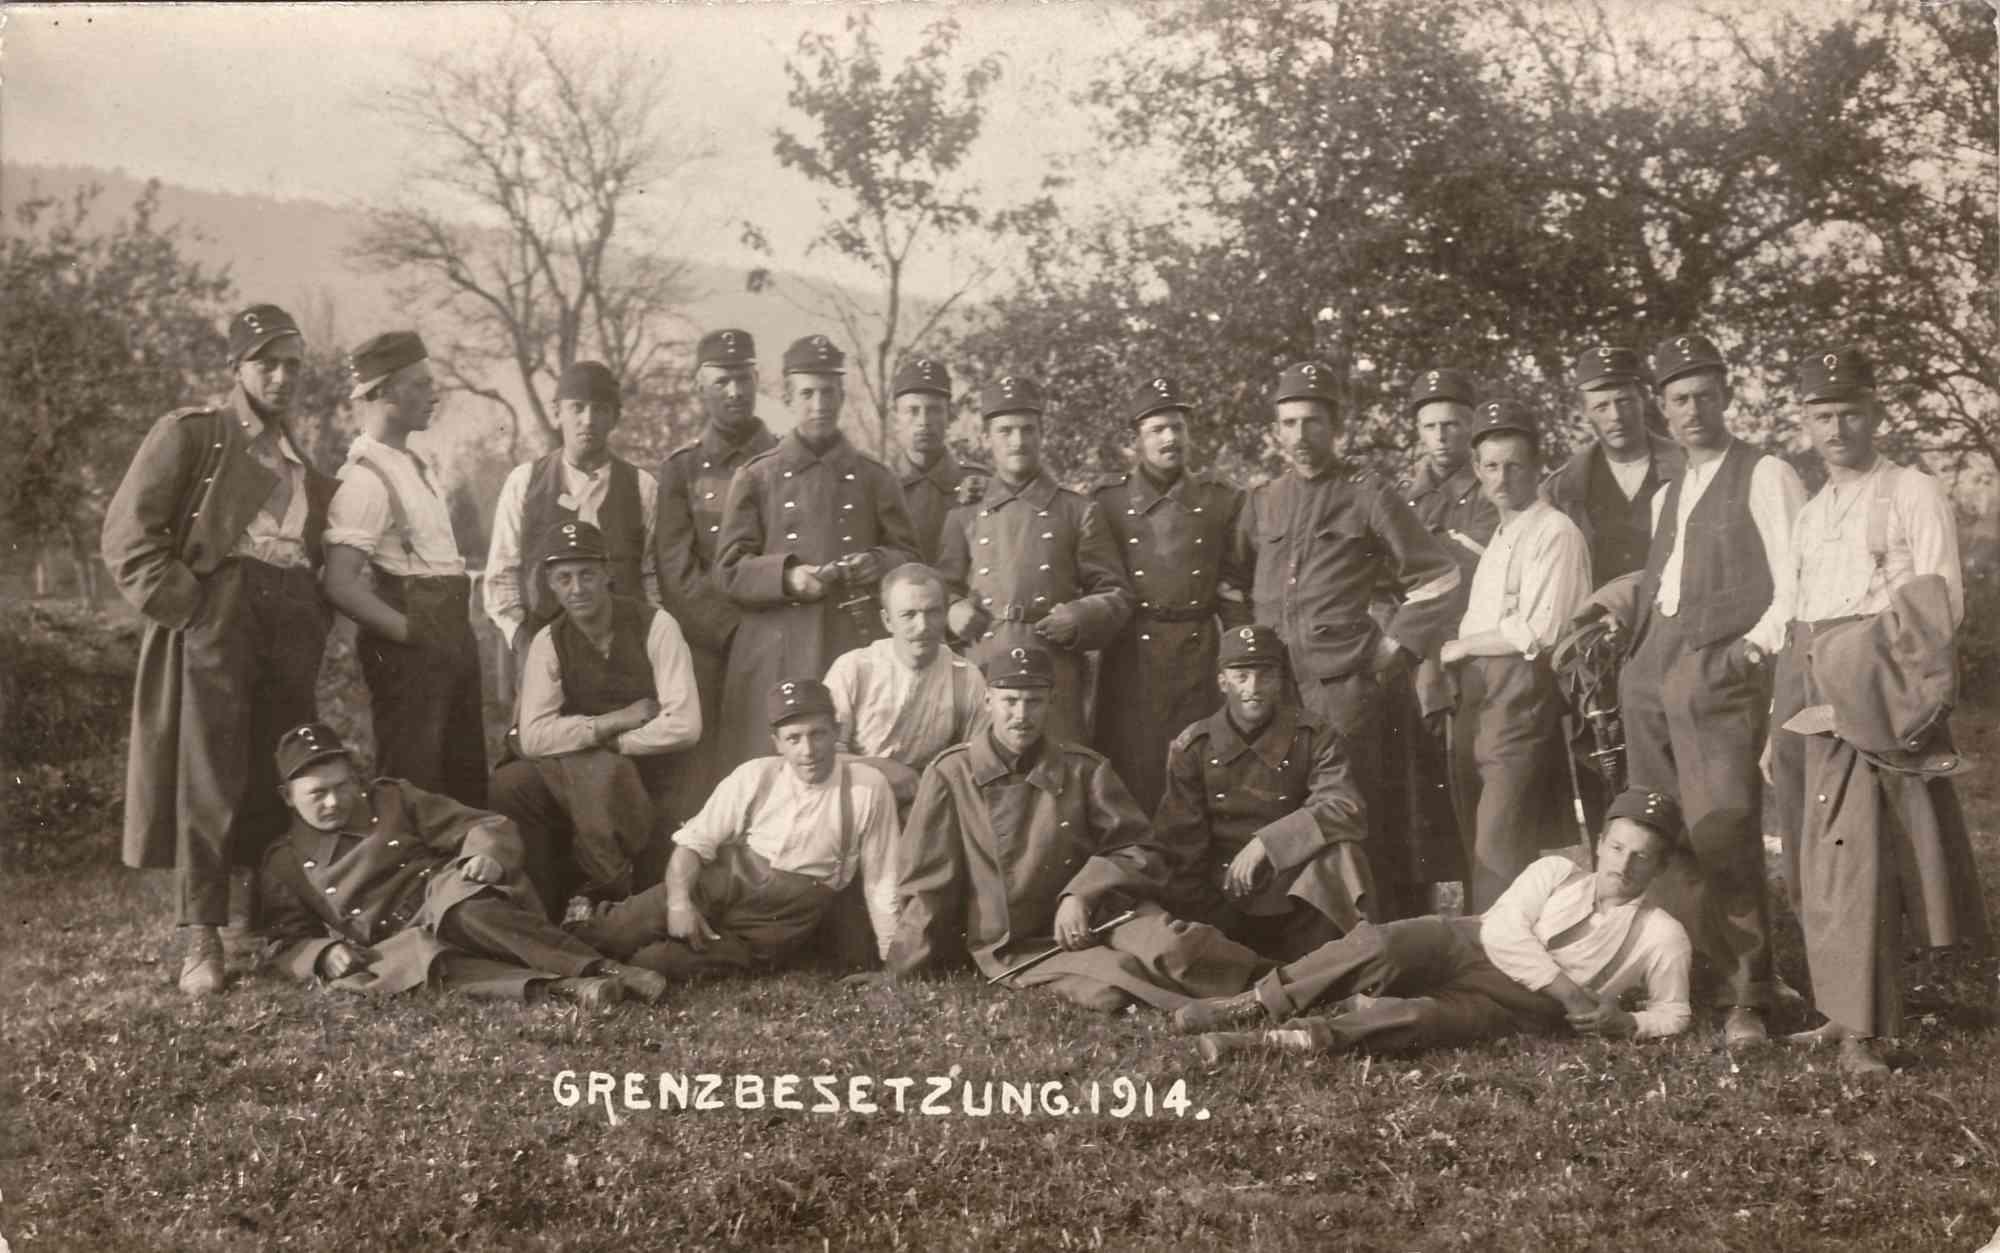 Bild: Postkarte Grenzbesetzung 1914, Albert Gürtler unten links